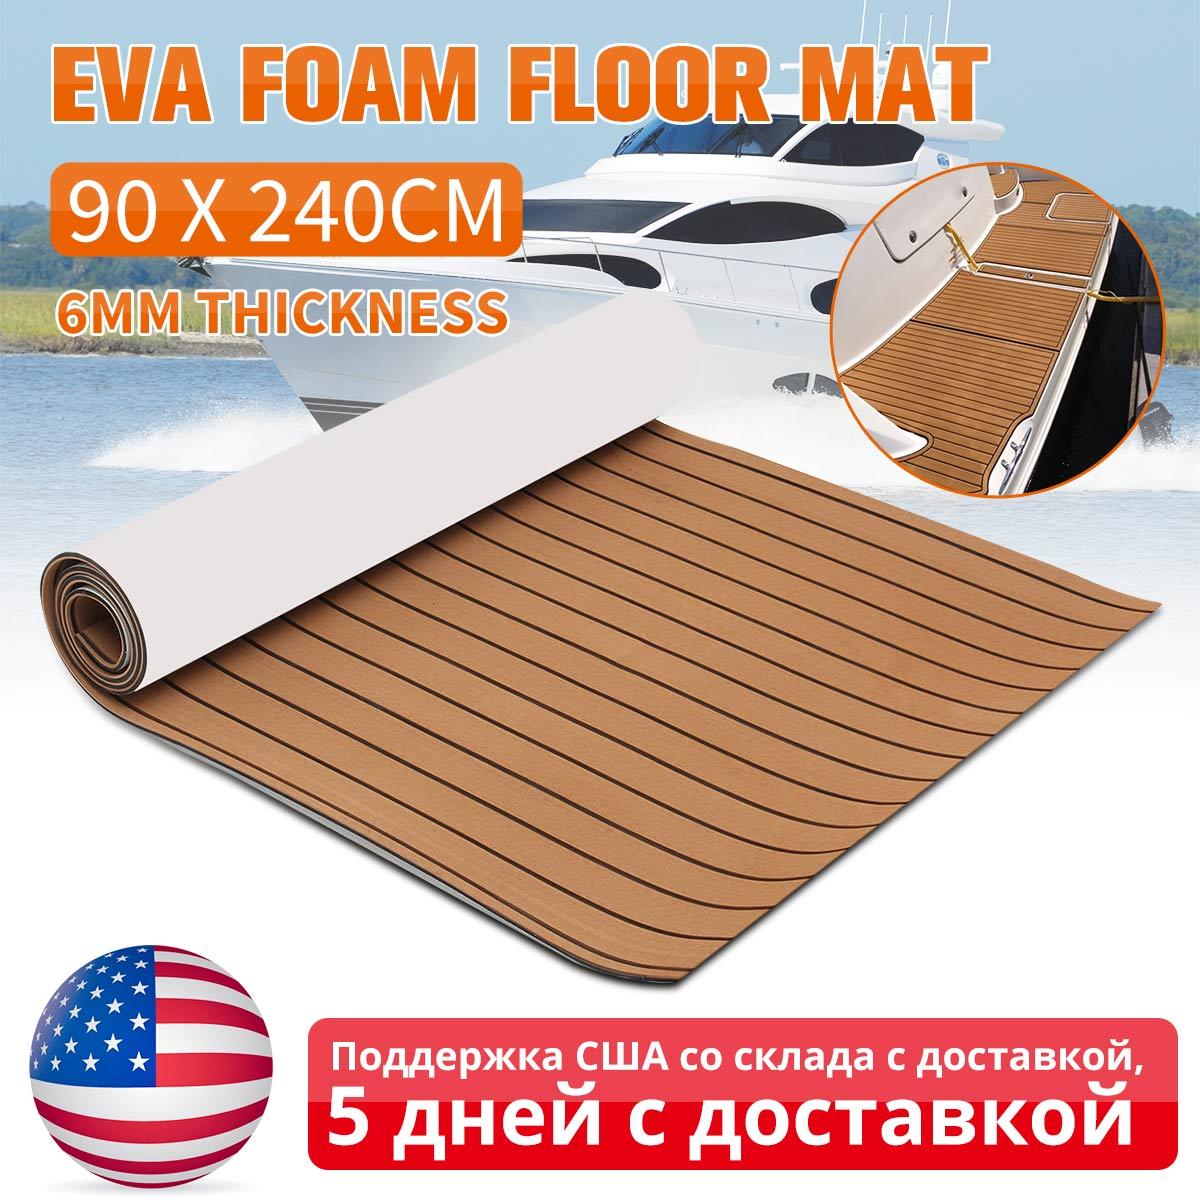 240cm X 90cm X 6mm Self Adhesive EVA Foam Teak Floor Faux Teak Sheet Boat Yacht Synthetic Teak Decking Floor Mat Carpet